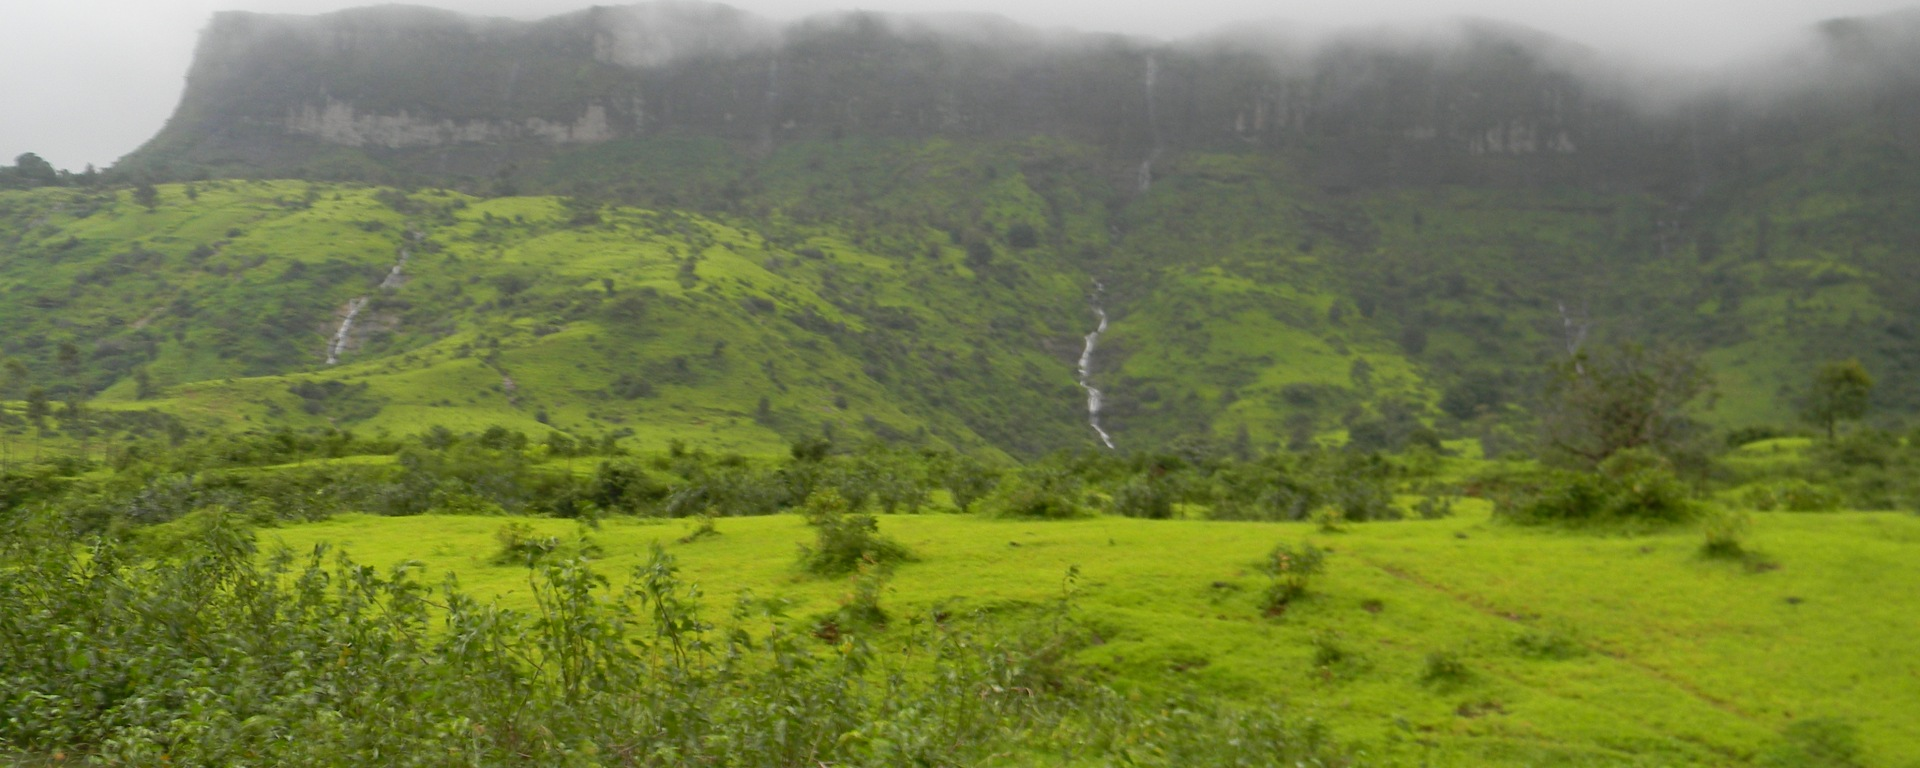 Bramhagiri Nashik